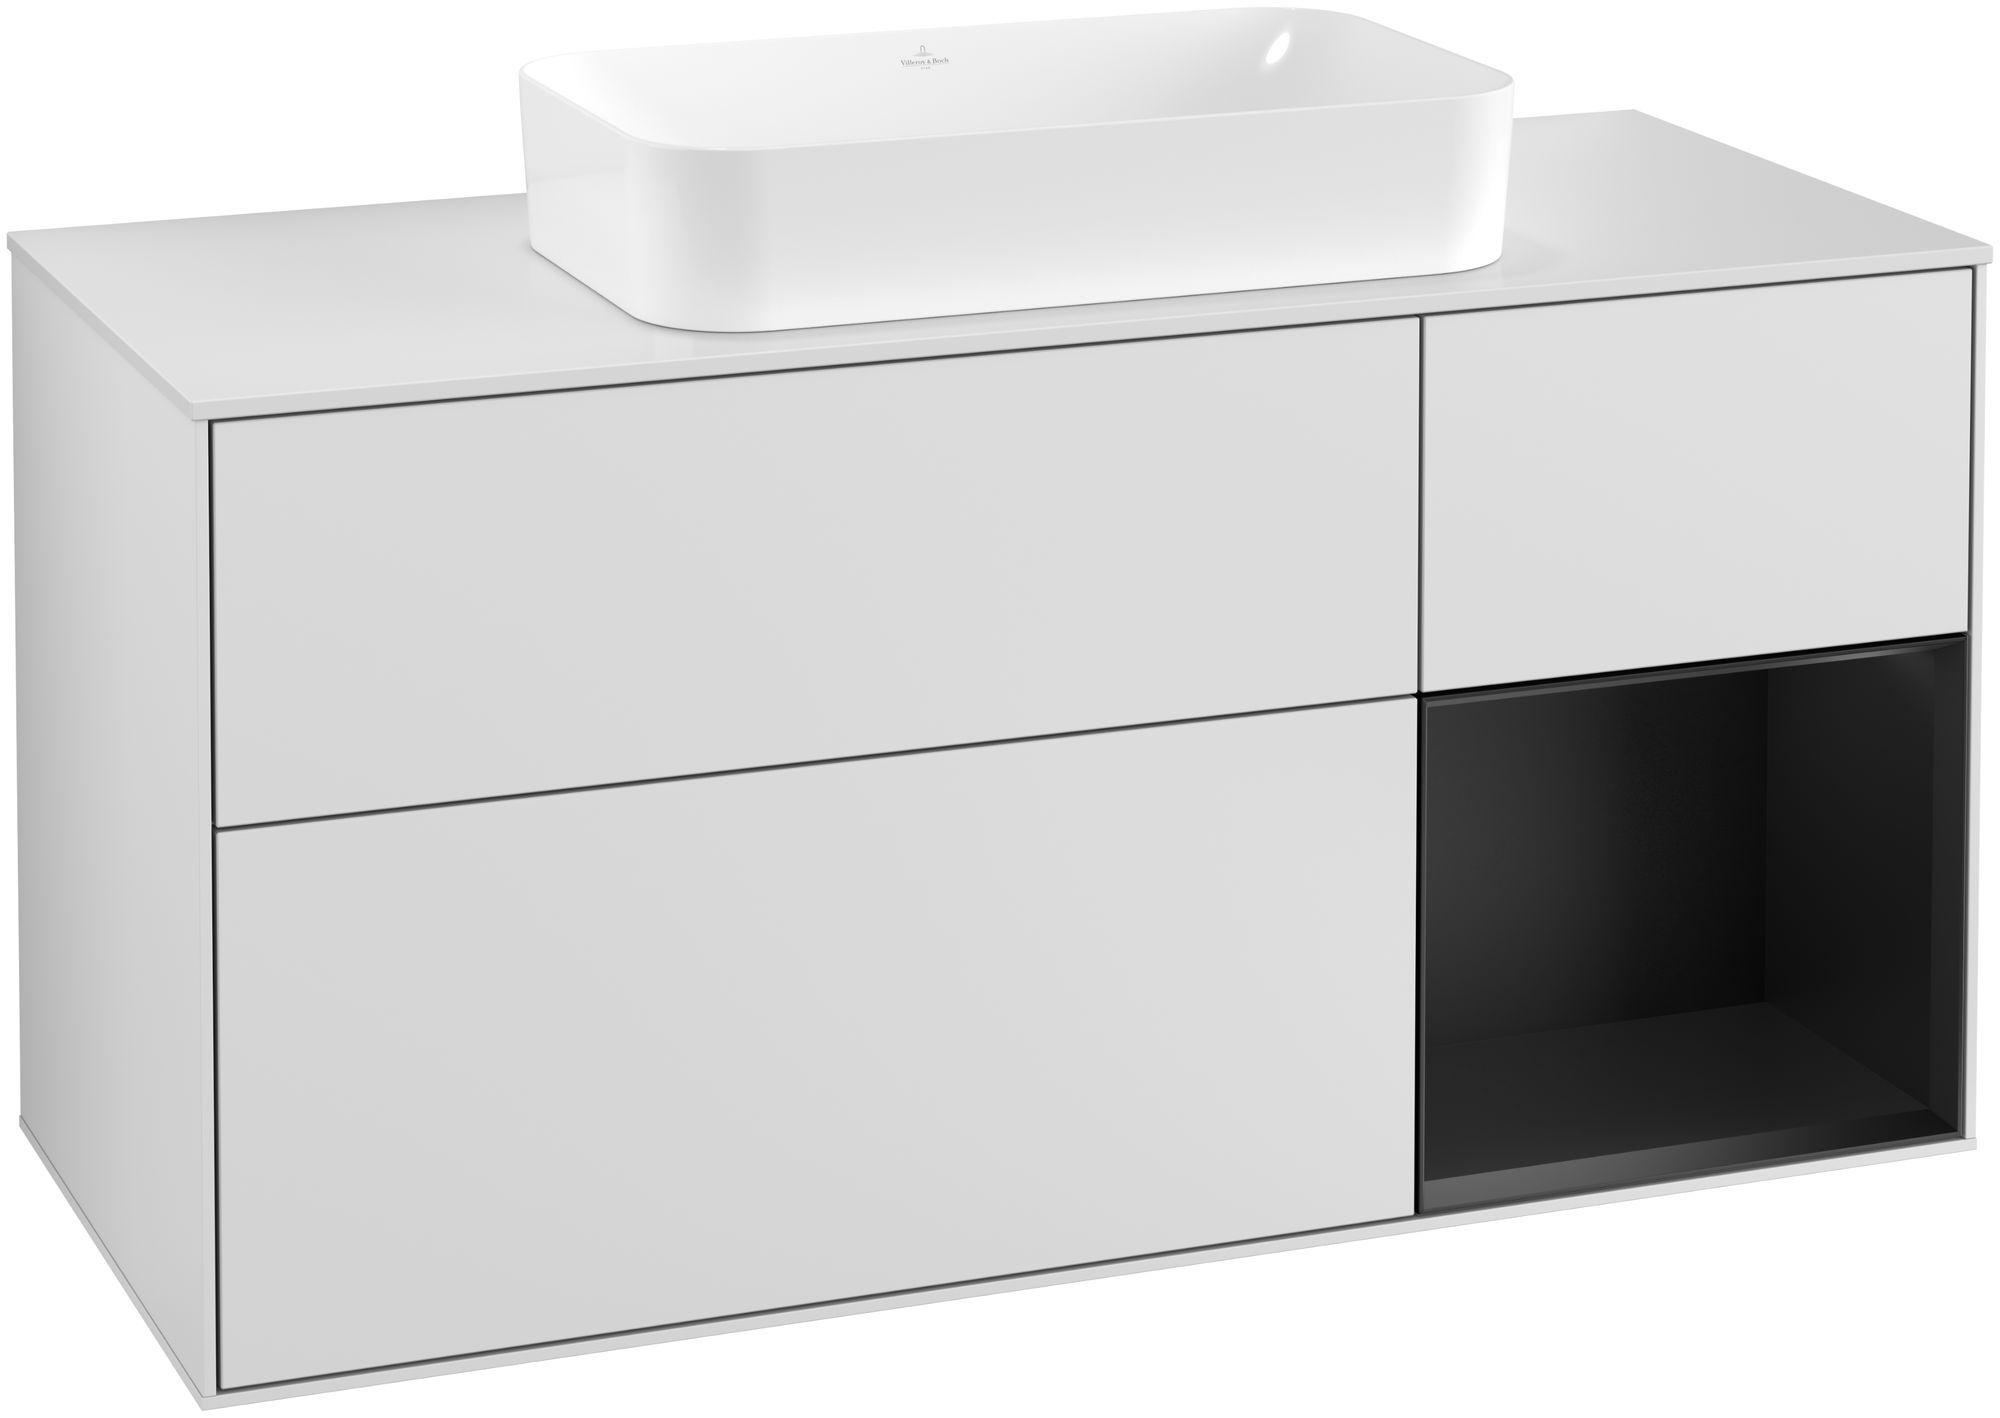 Villeroy & Boch Finion G30 Waschtischunterschrank mit Regalelement 3 Auszüge Waschtisch mittig LED-Beleuchtung B:120xH:60,3xT:50,1cm Front, Korpus: Weiß Matt Soft Grey, Regal: Black Matt Lacquer, Glasplatte: White Matt G301PDMT